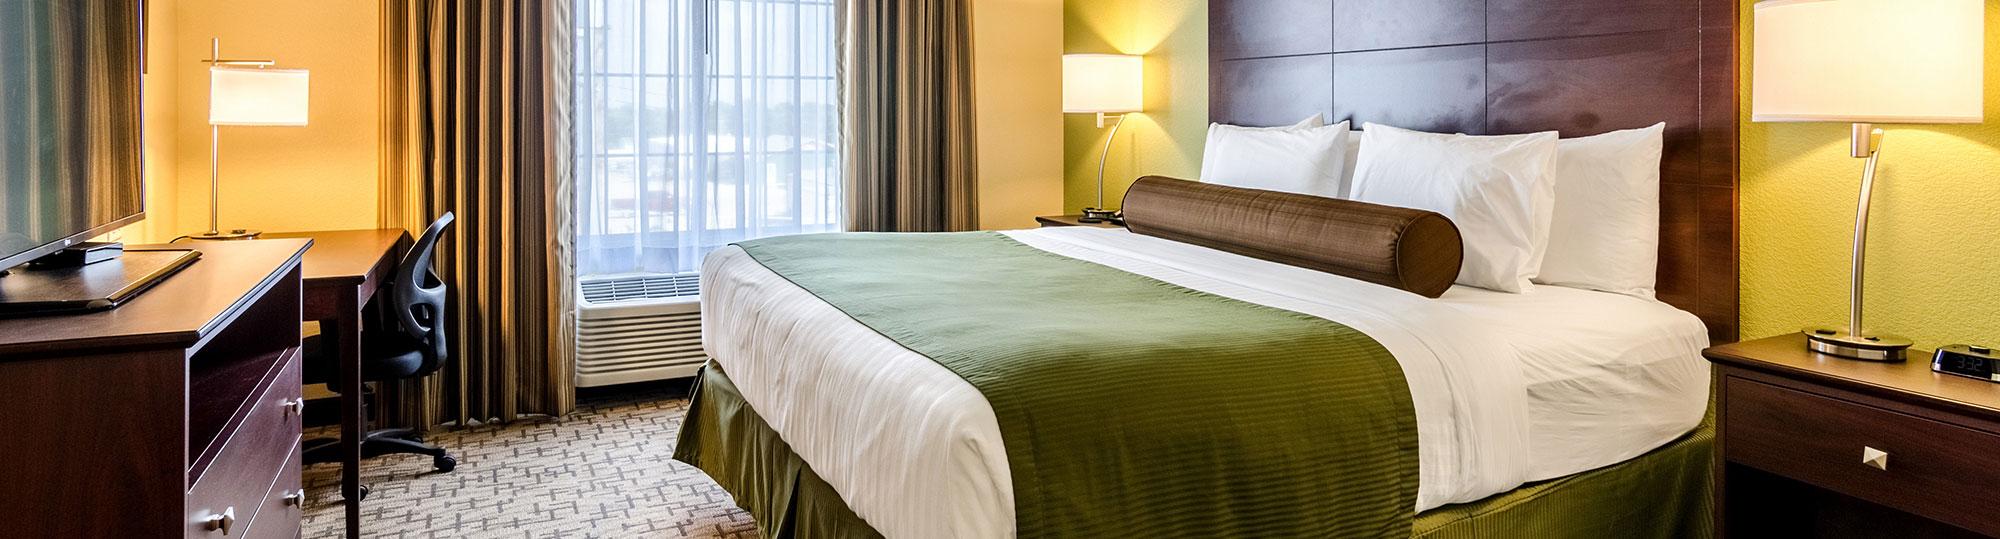 Cobblestone Hotel and Suites Cozad